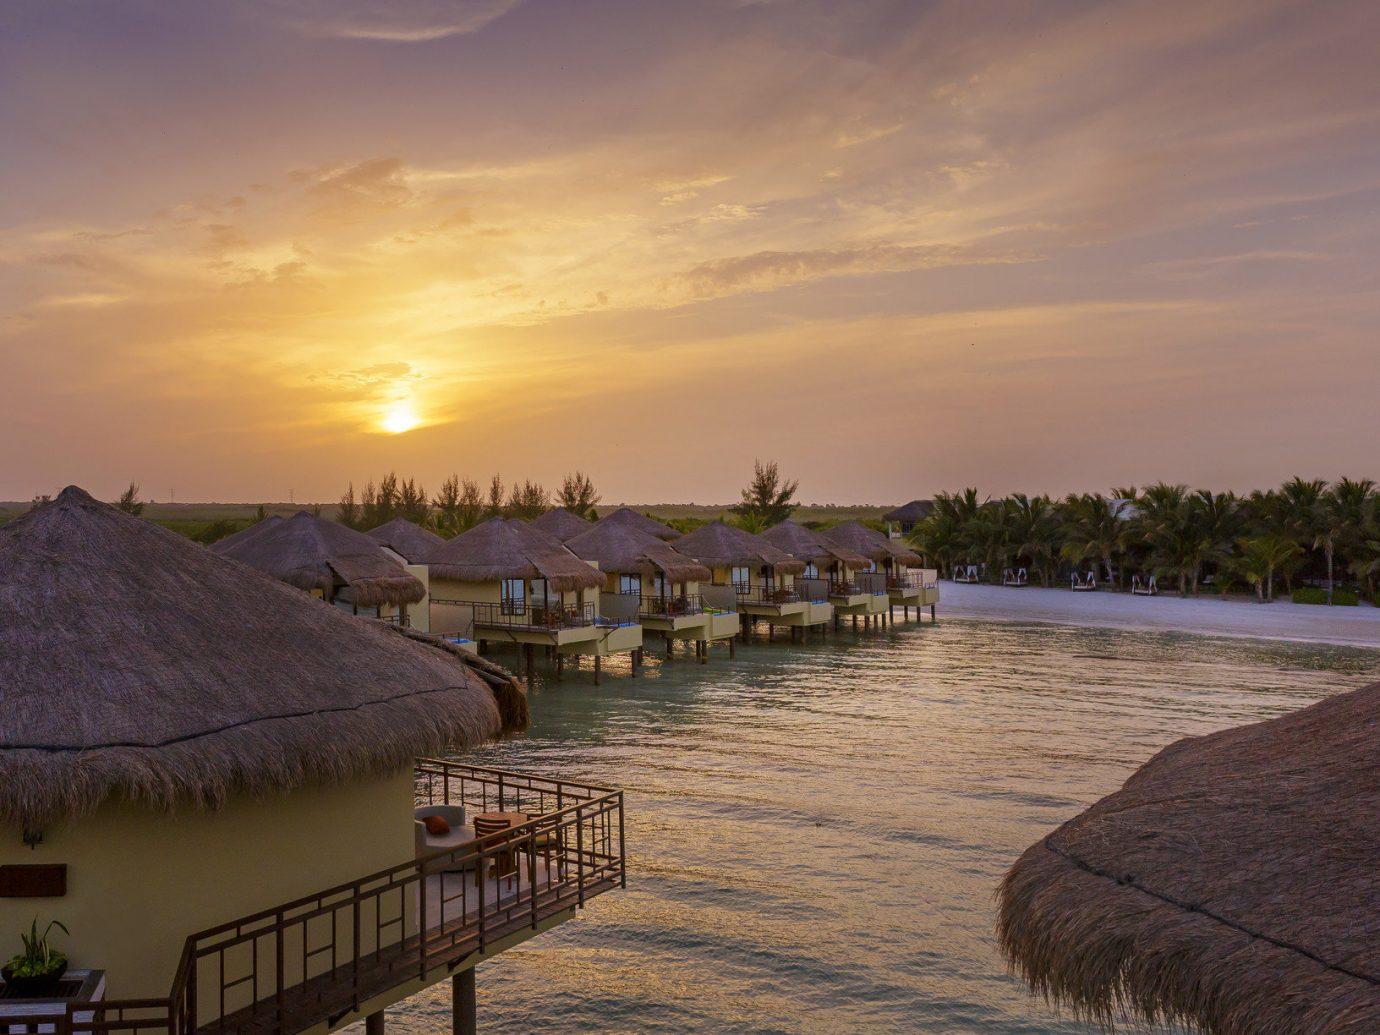 Hotels sky outdoor water shore Sea Sunset morning vacation Beach Ocean evening Coast dusk River dawn bay sunrise